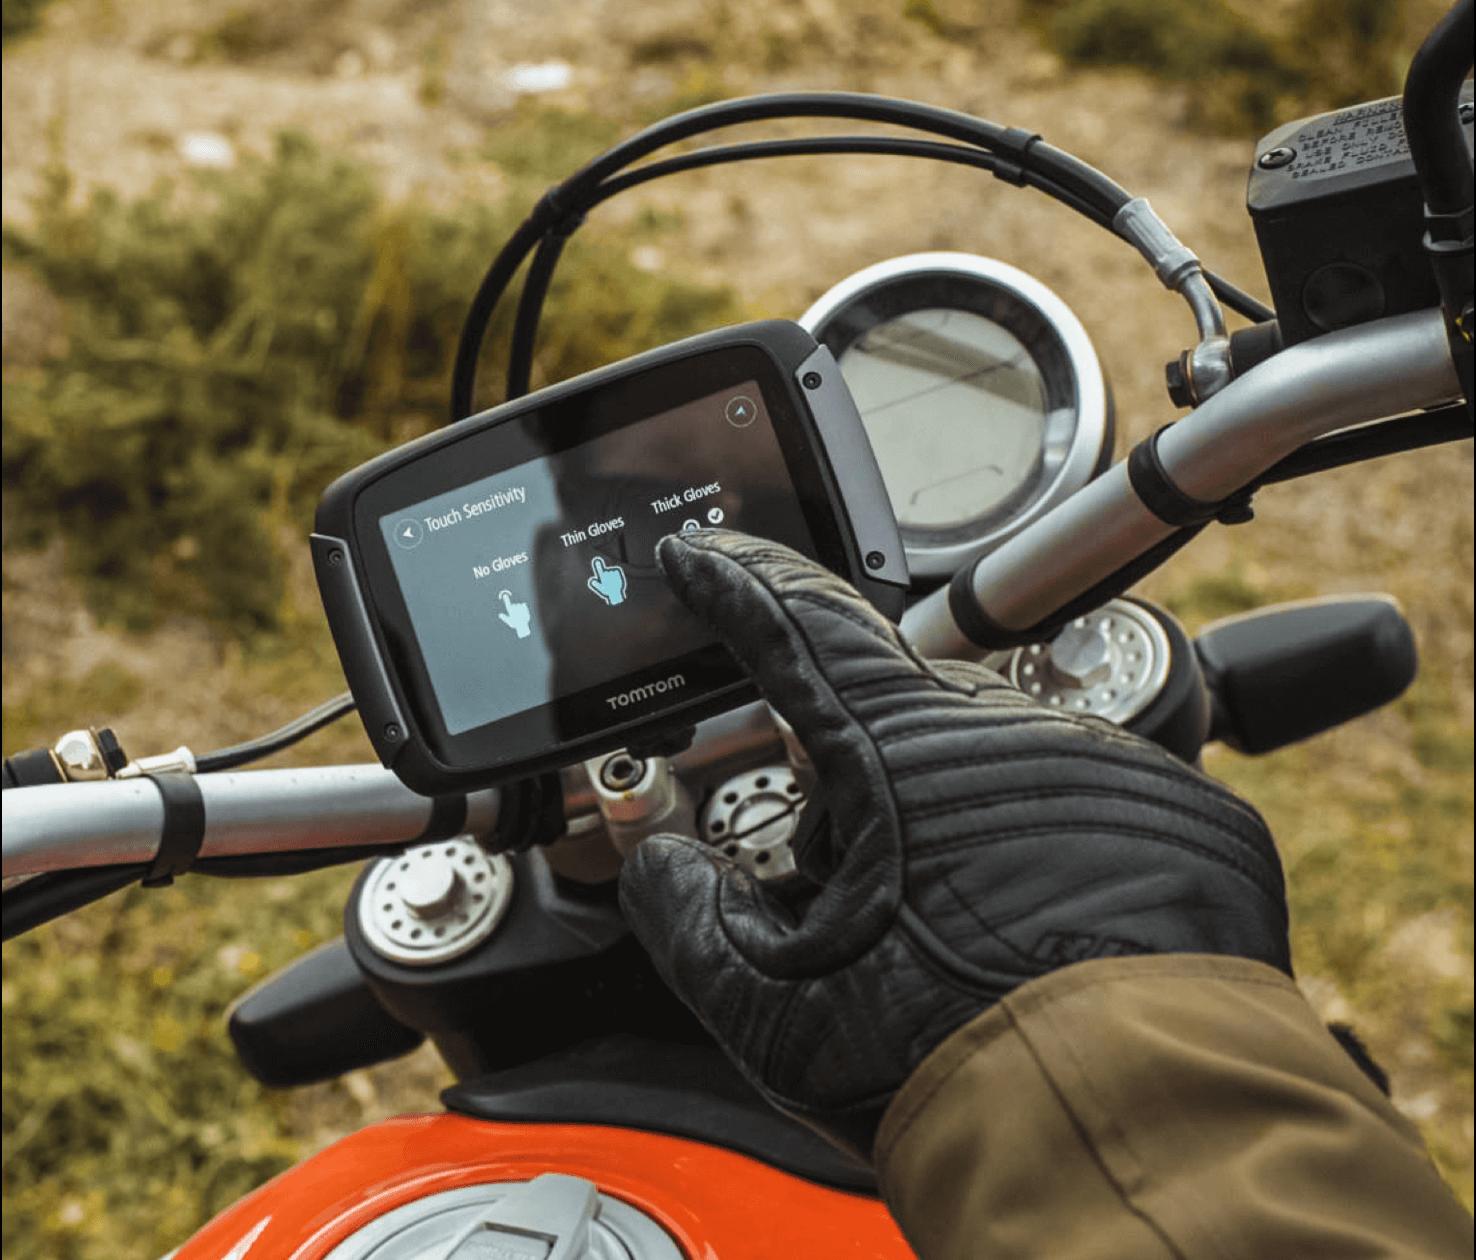 TomTom GPS Motorcycle Navigation Rider